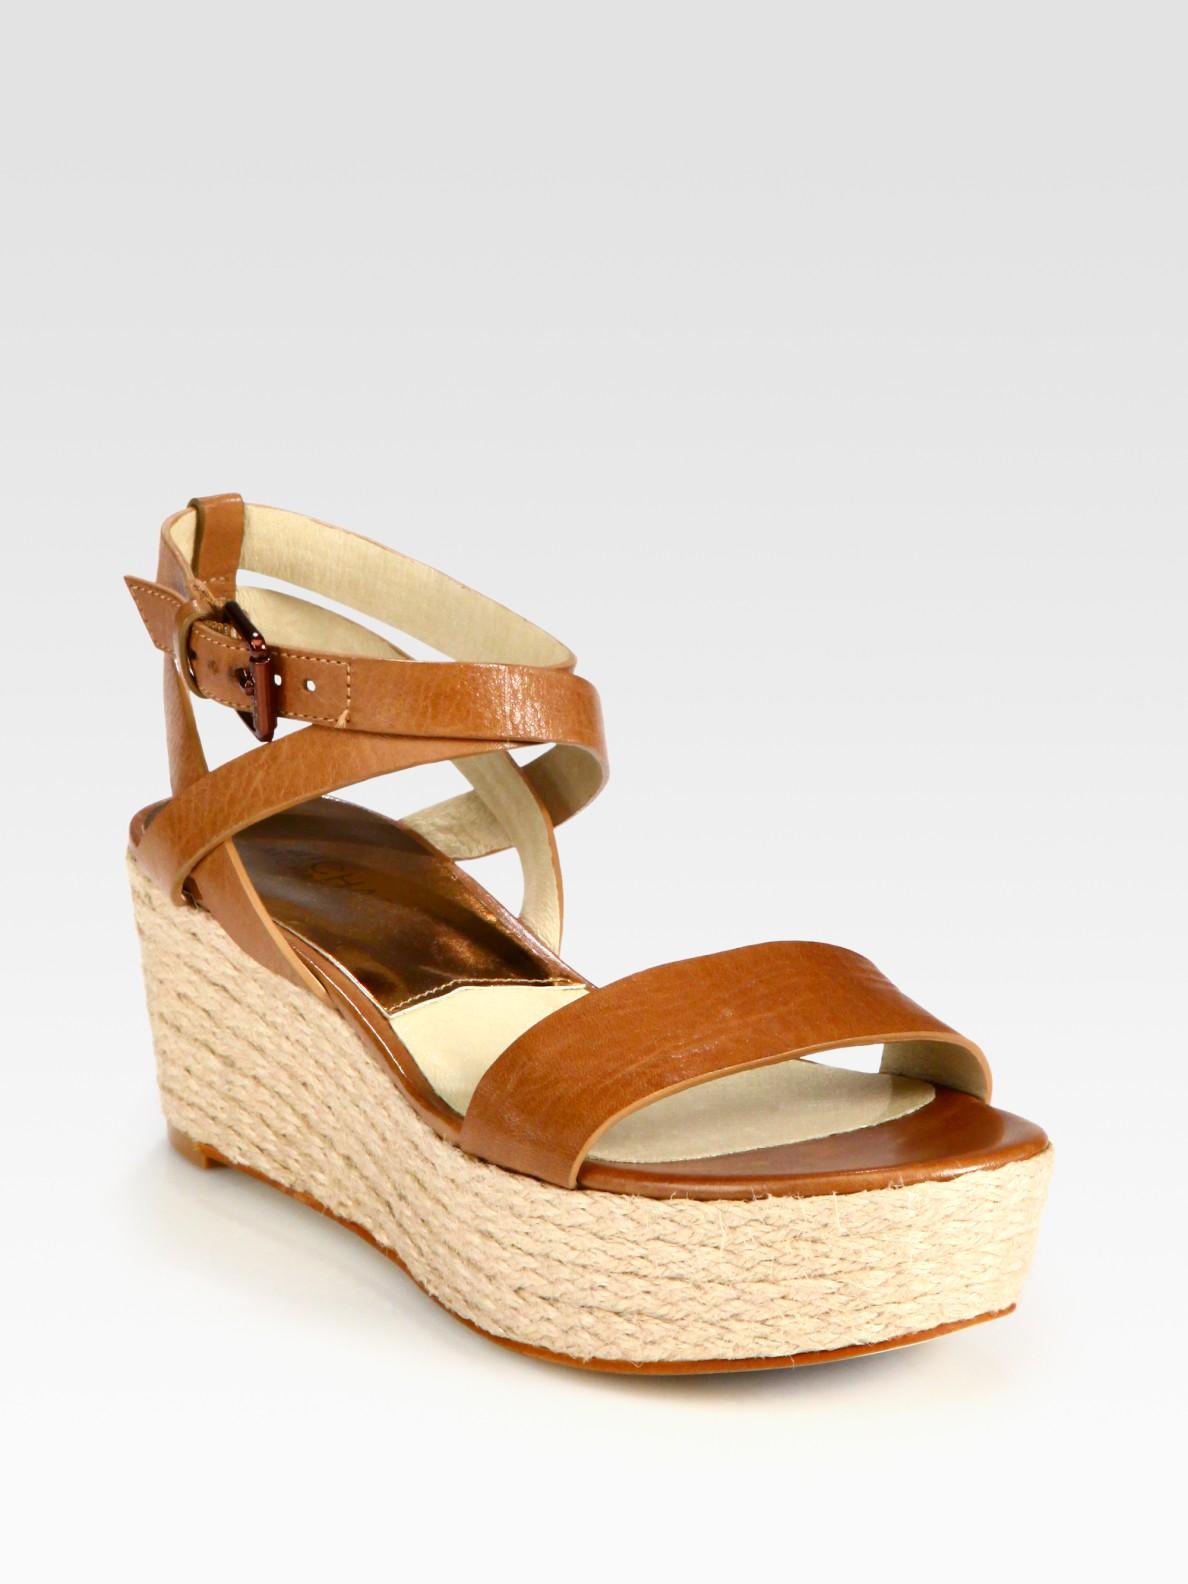 michael michael kors jalita leather espadrille wedge sandals in beige tan lyst. Black Bedroom Furniture Sets. Home Design Ideas